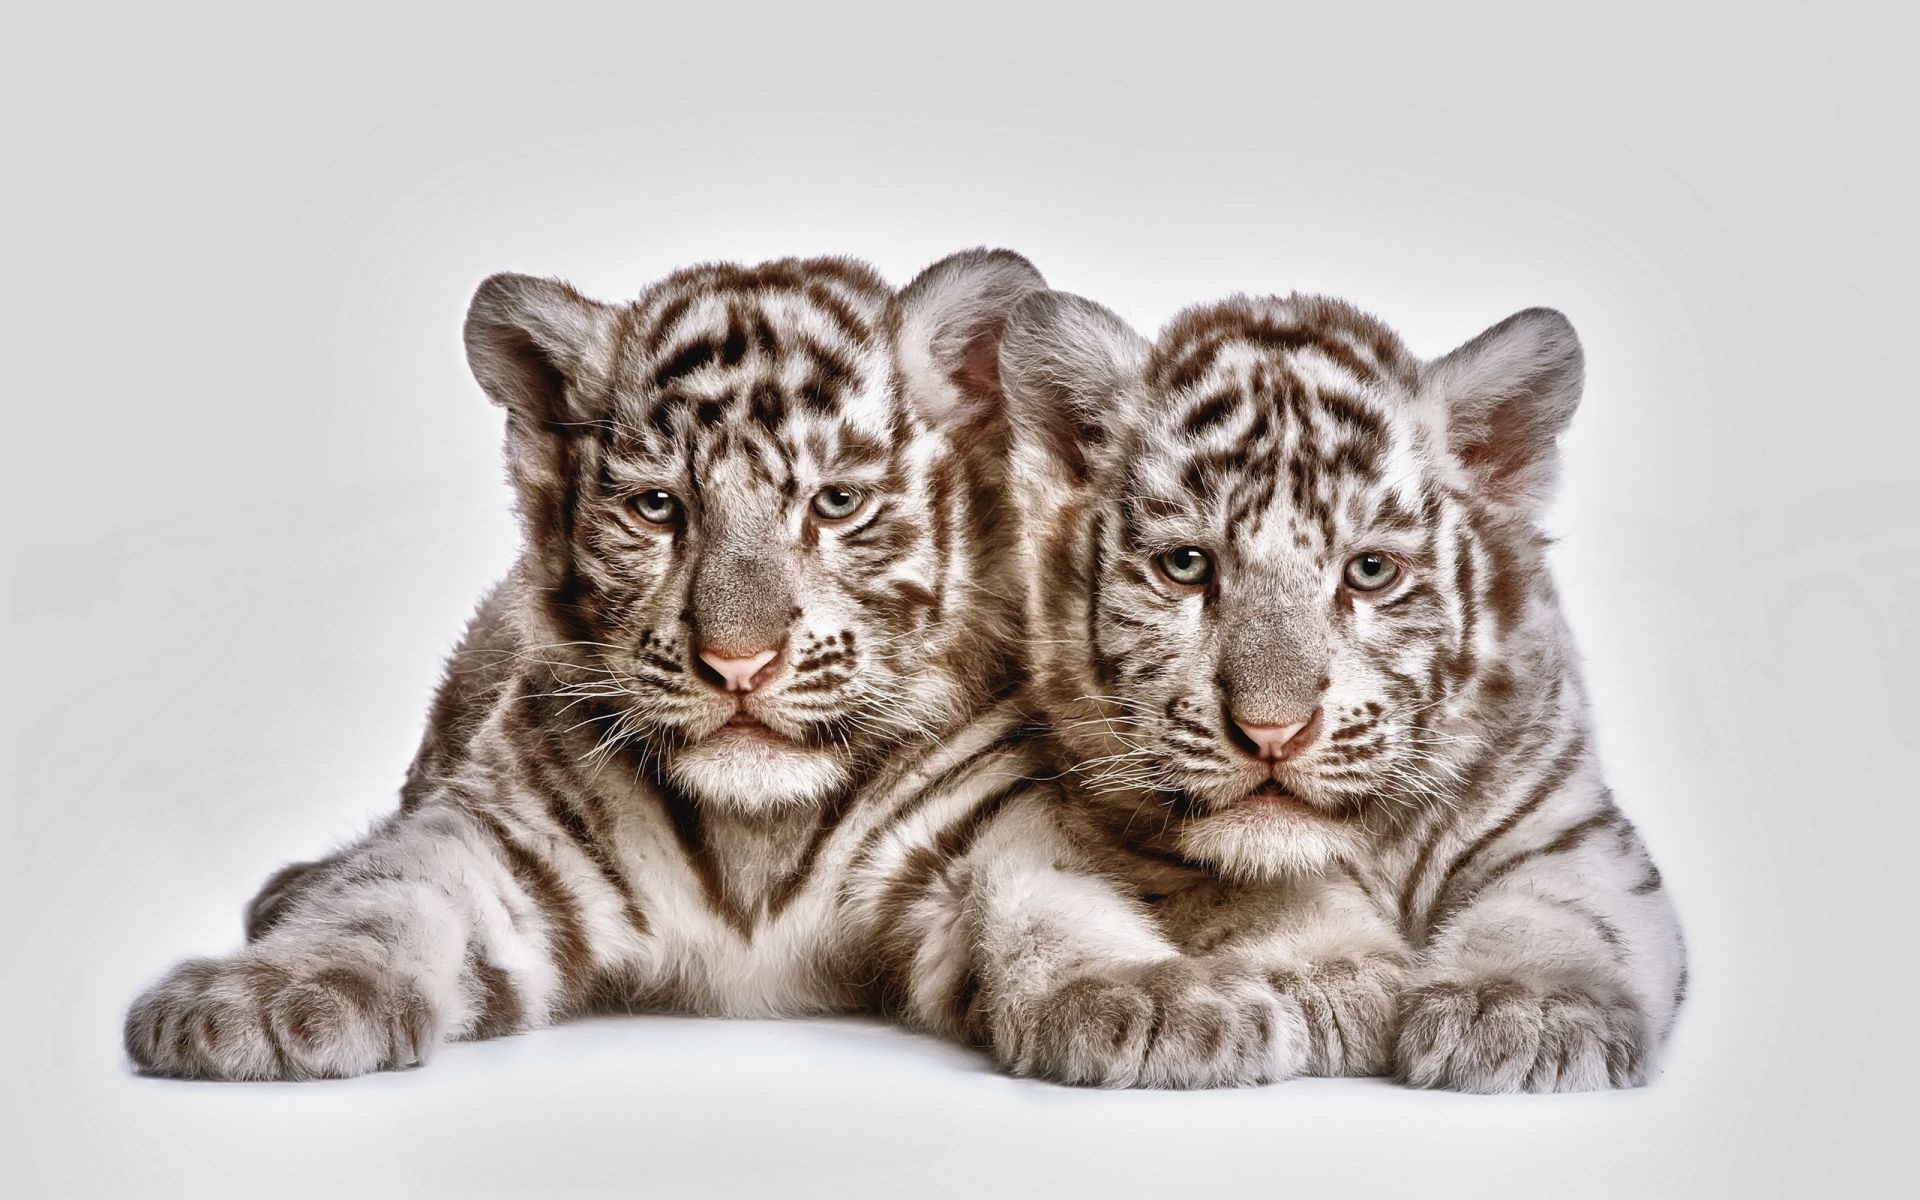 Tiger Baby, Good Wallpaper